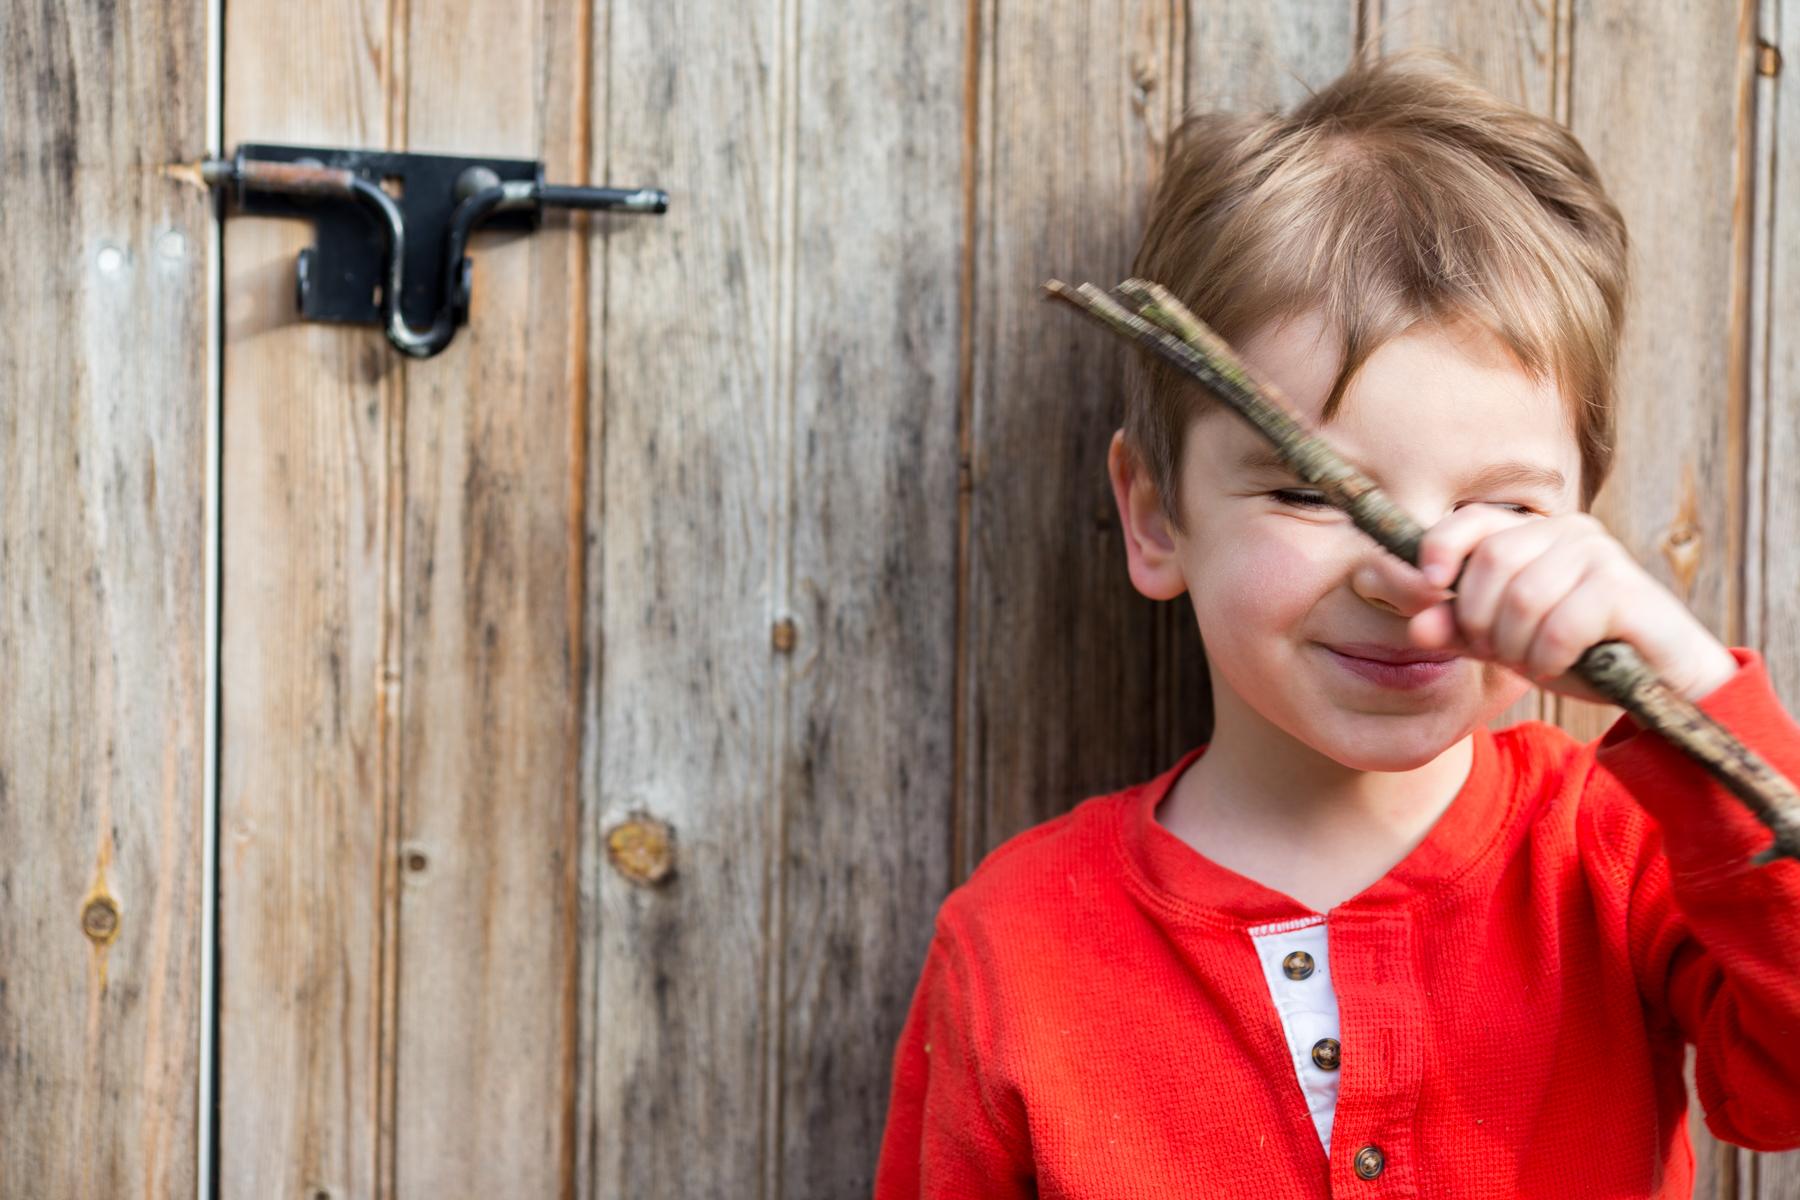 Noah, son of artist Megan Carty, age 4